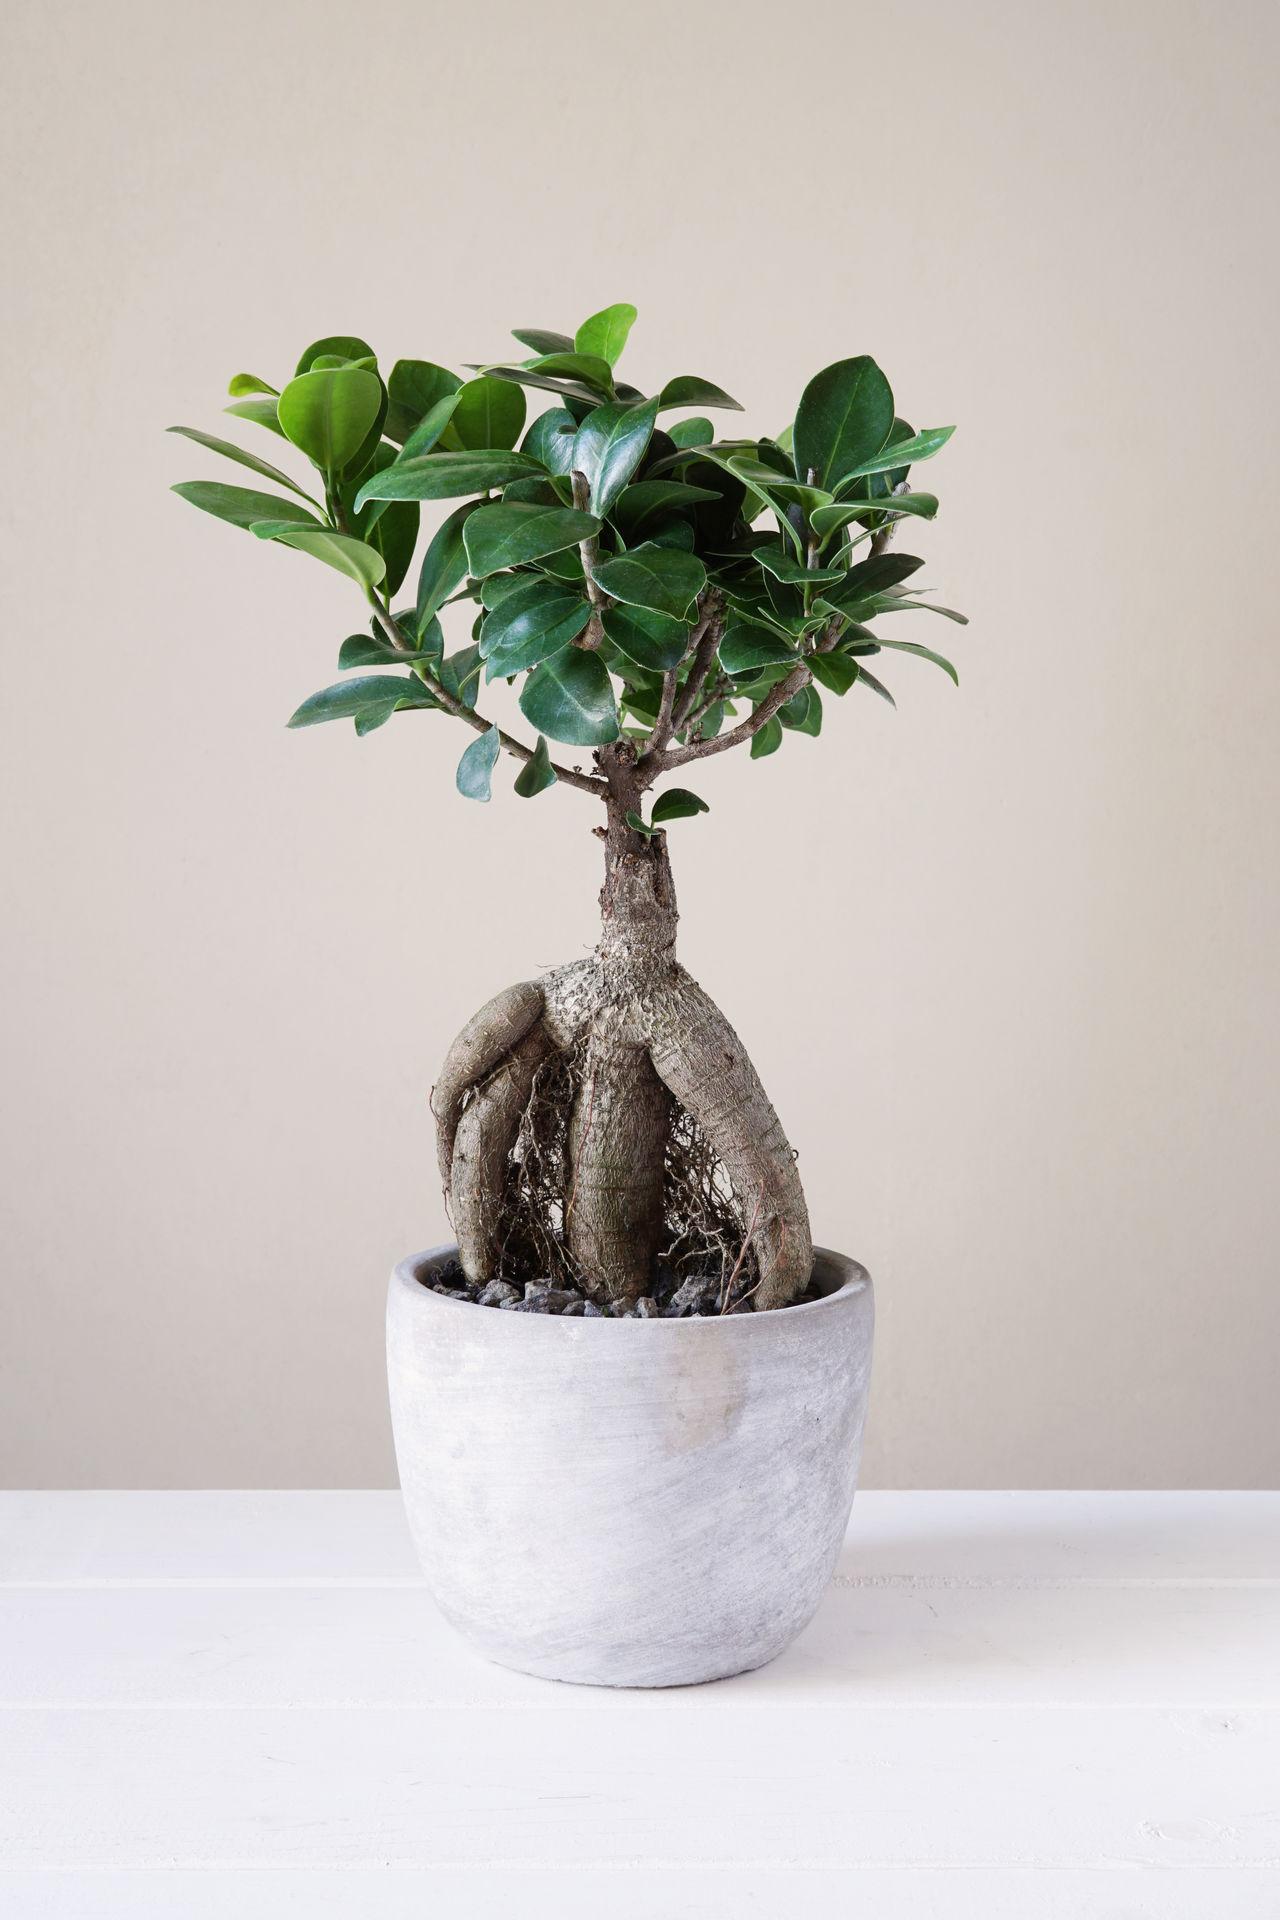 Bonsai Ginseng or Ficus Retusa Bonsai Ficus Ficus Ginseng Ficus Retusa Ginseng Growth House Plant Houseplant Indoor Miniature Minimalism Plant Potted Plant Tree